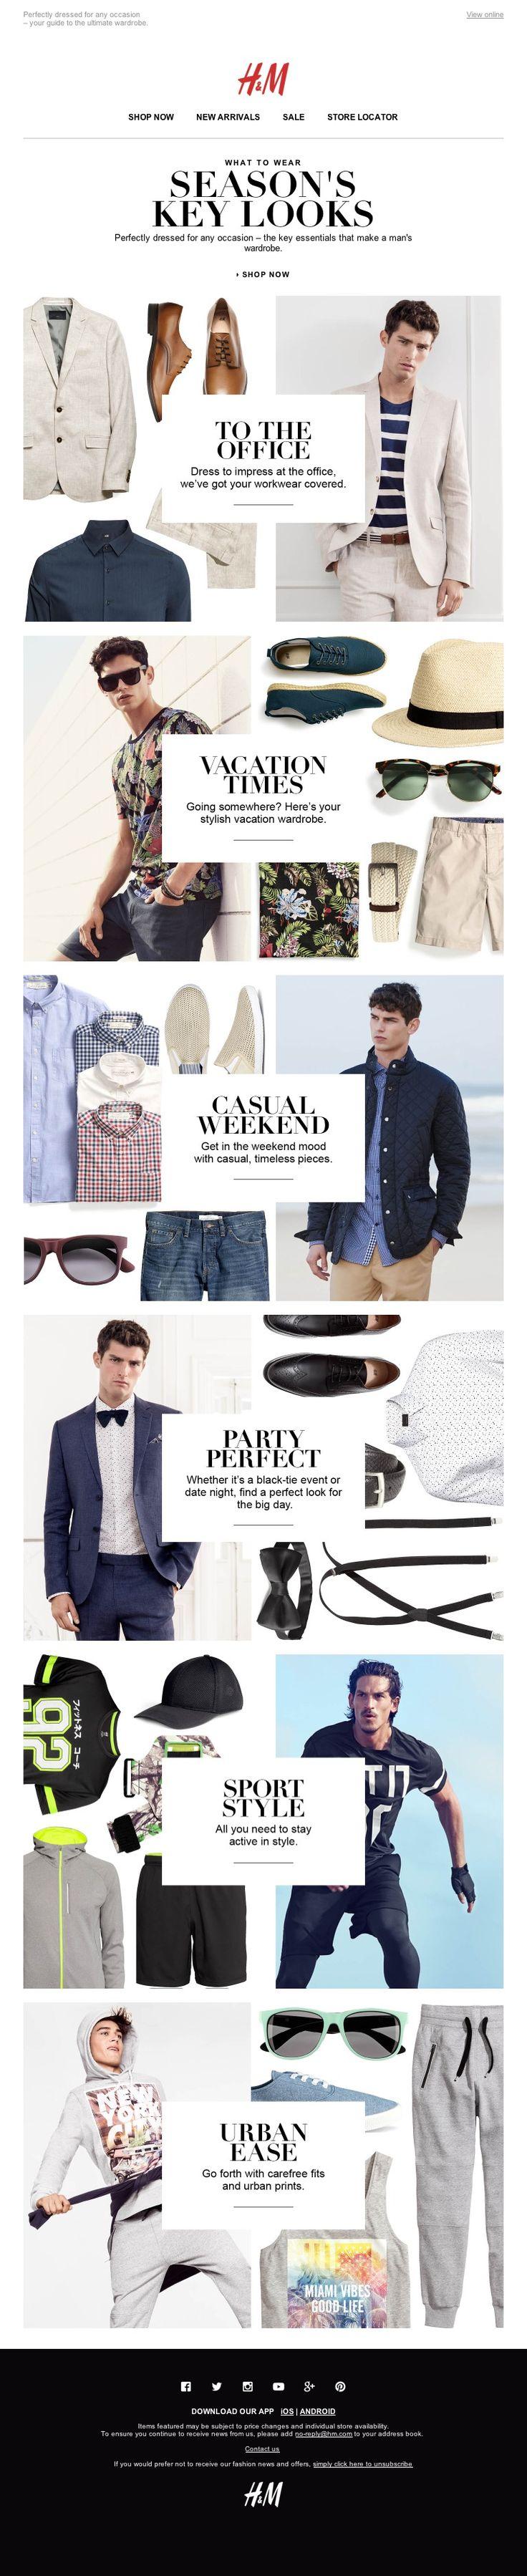 best 25 h m men ideas on pinterest denim fashion tomboy outfits and menswear online. Black Bedroom Furniture Sets. Home Design Ideas